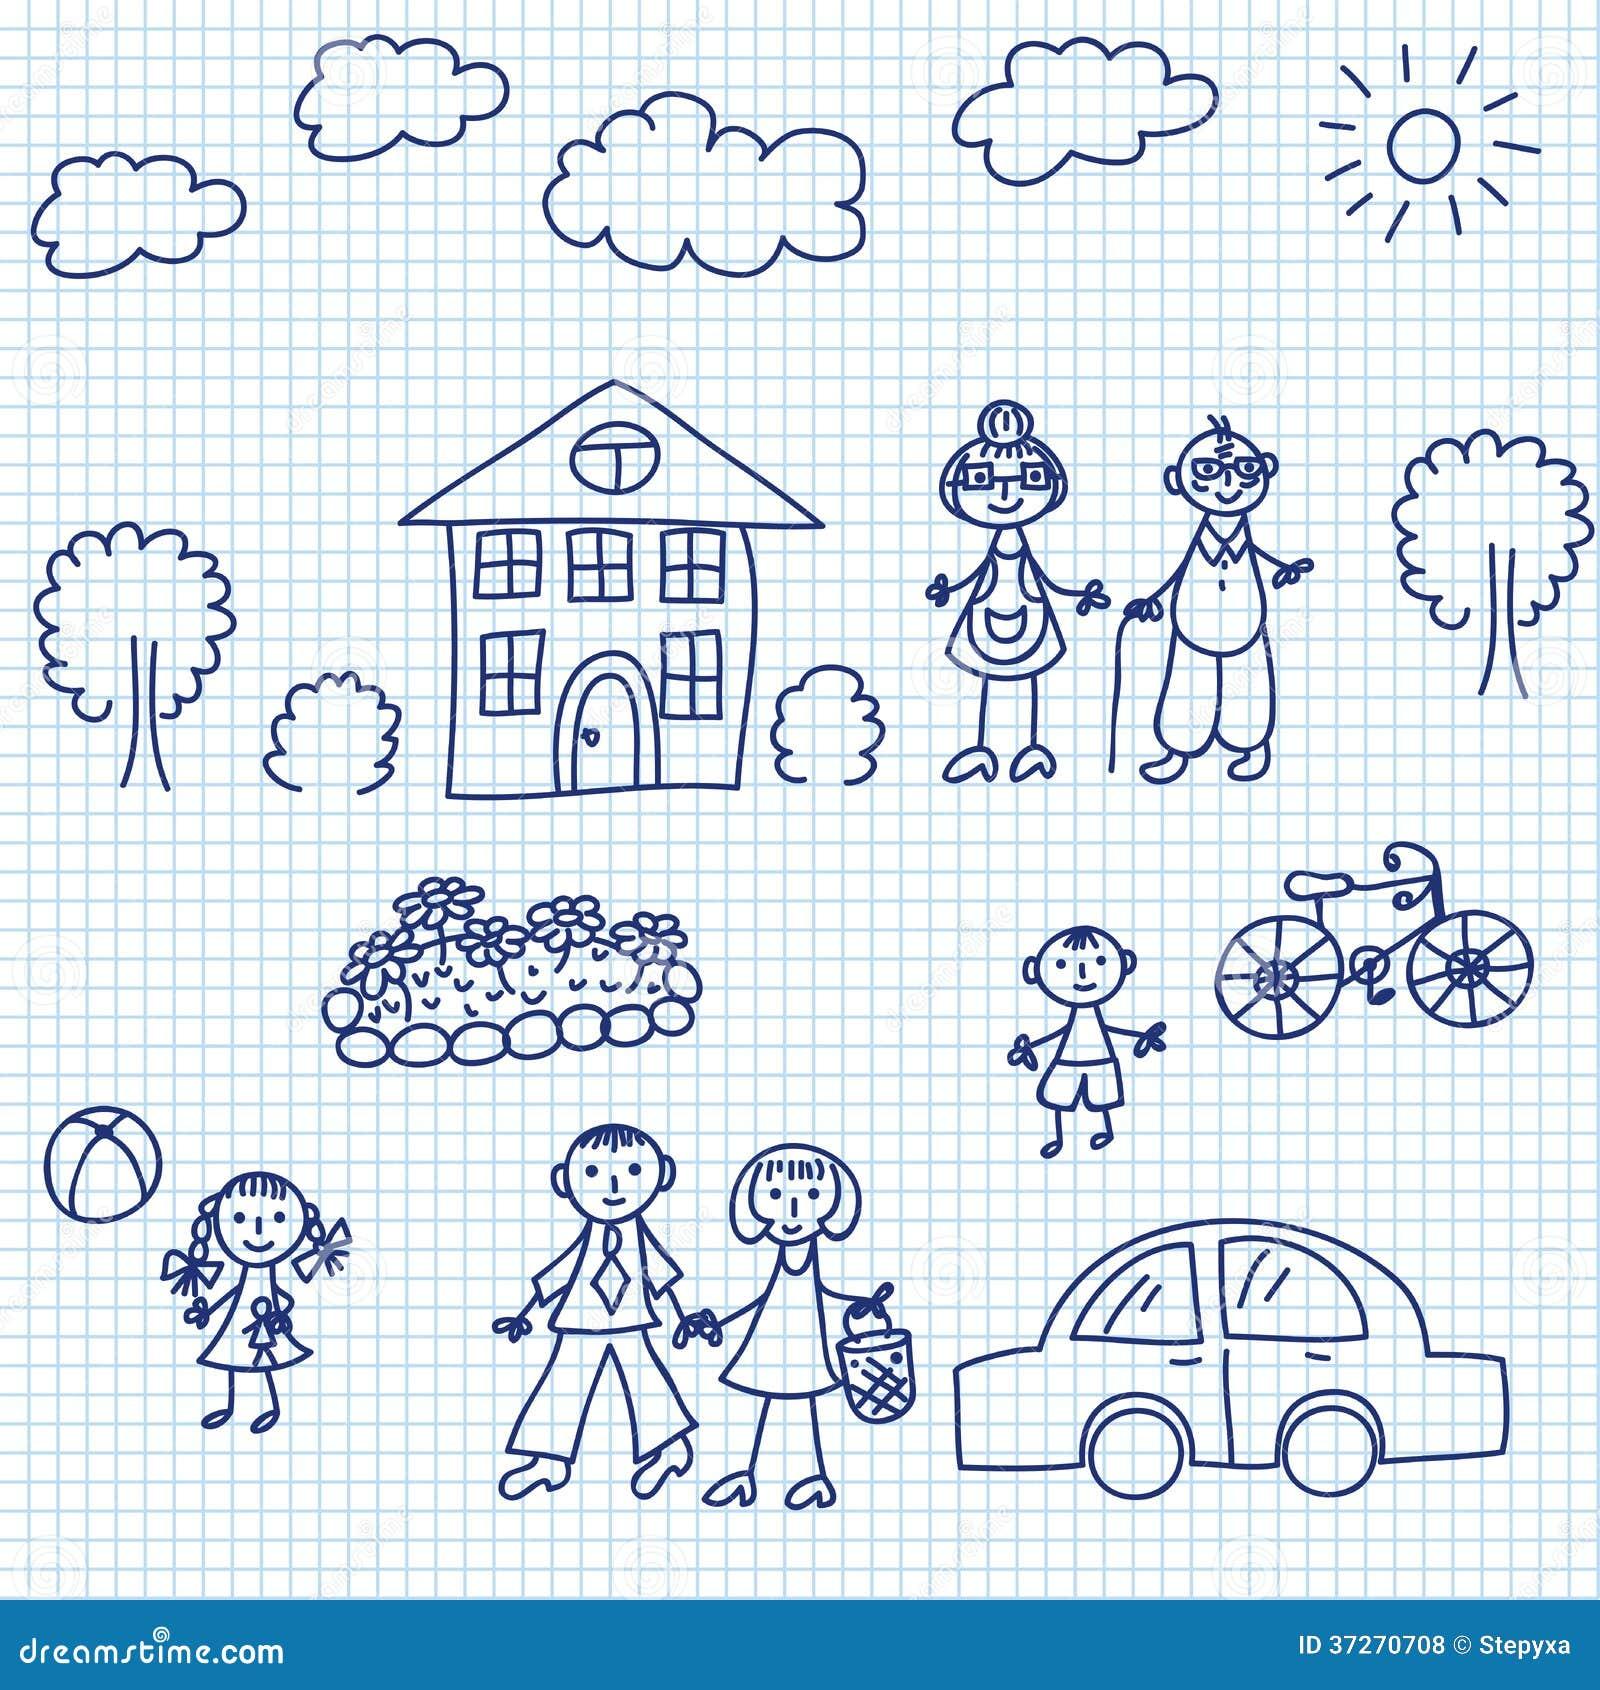 Kid drawing stock vector. Illustration of grandma, cute - 37270708